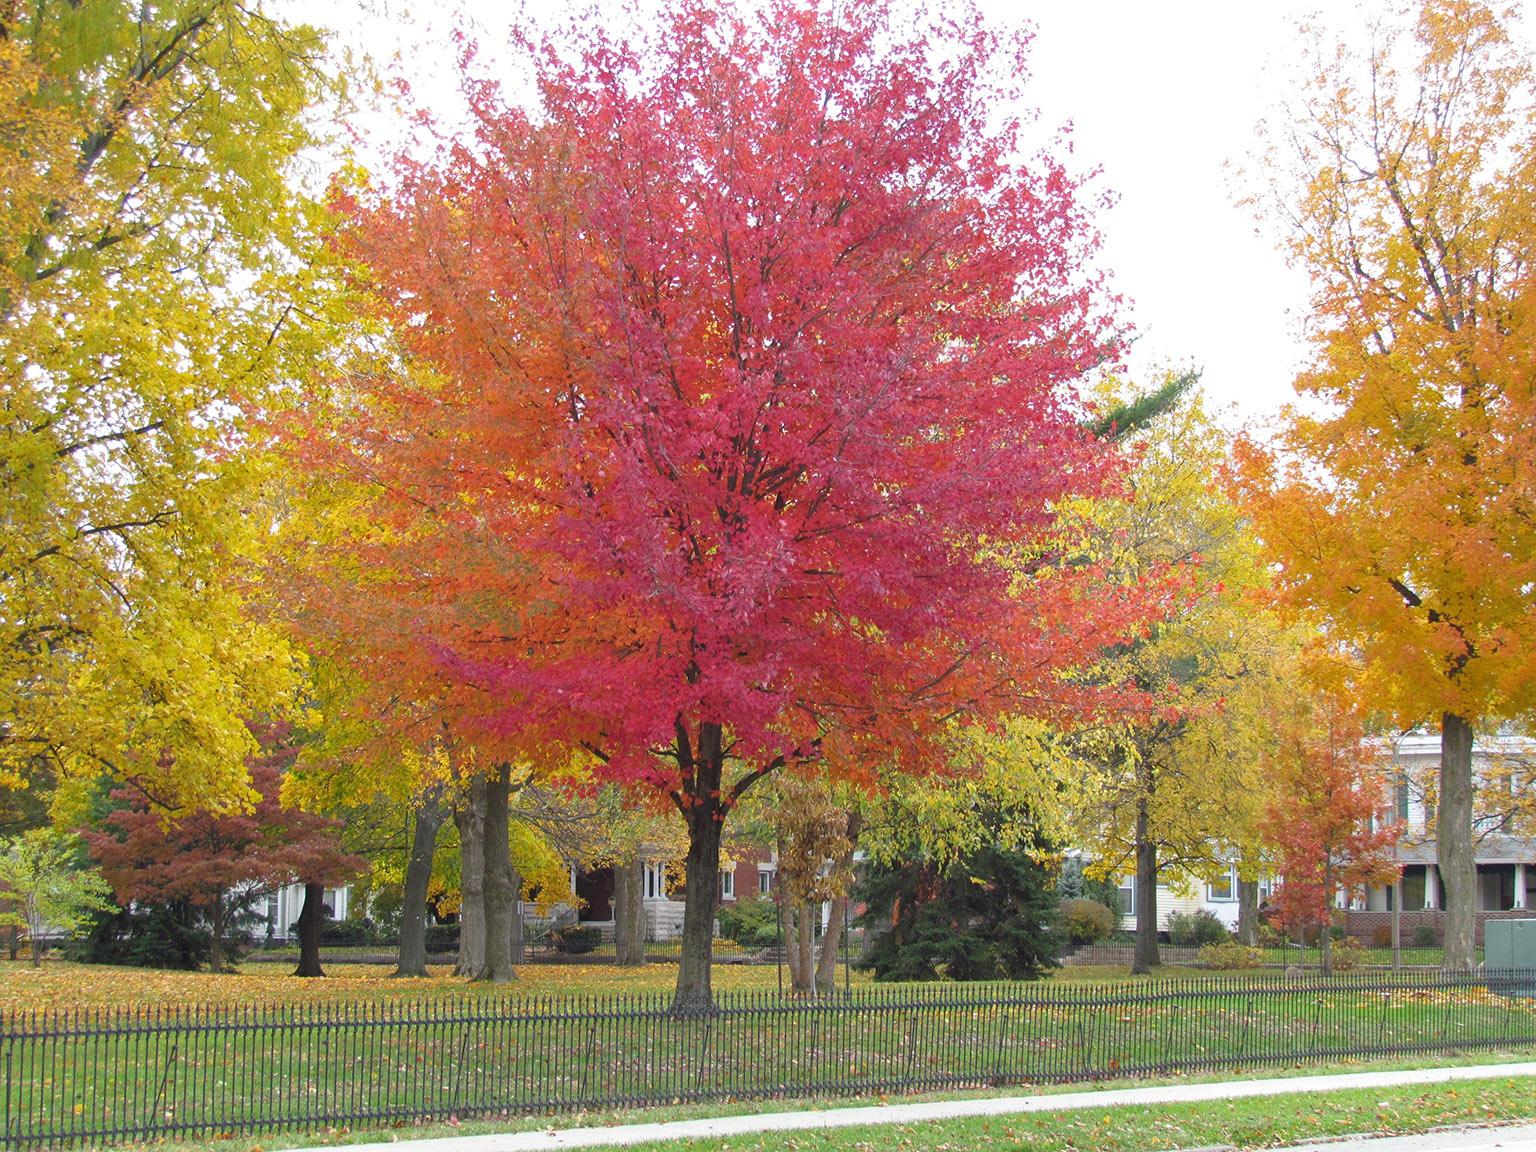 Indiana montgomery county linden - Indiana Montgomery County Linden 51